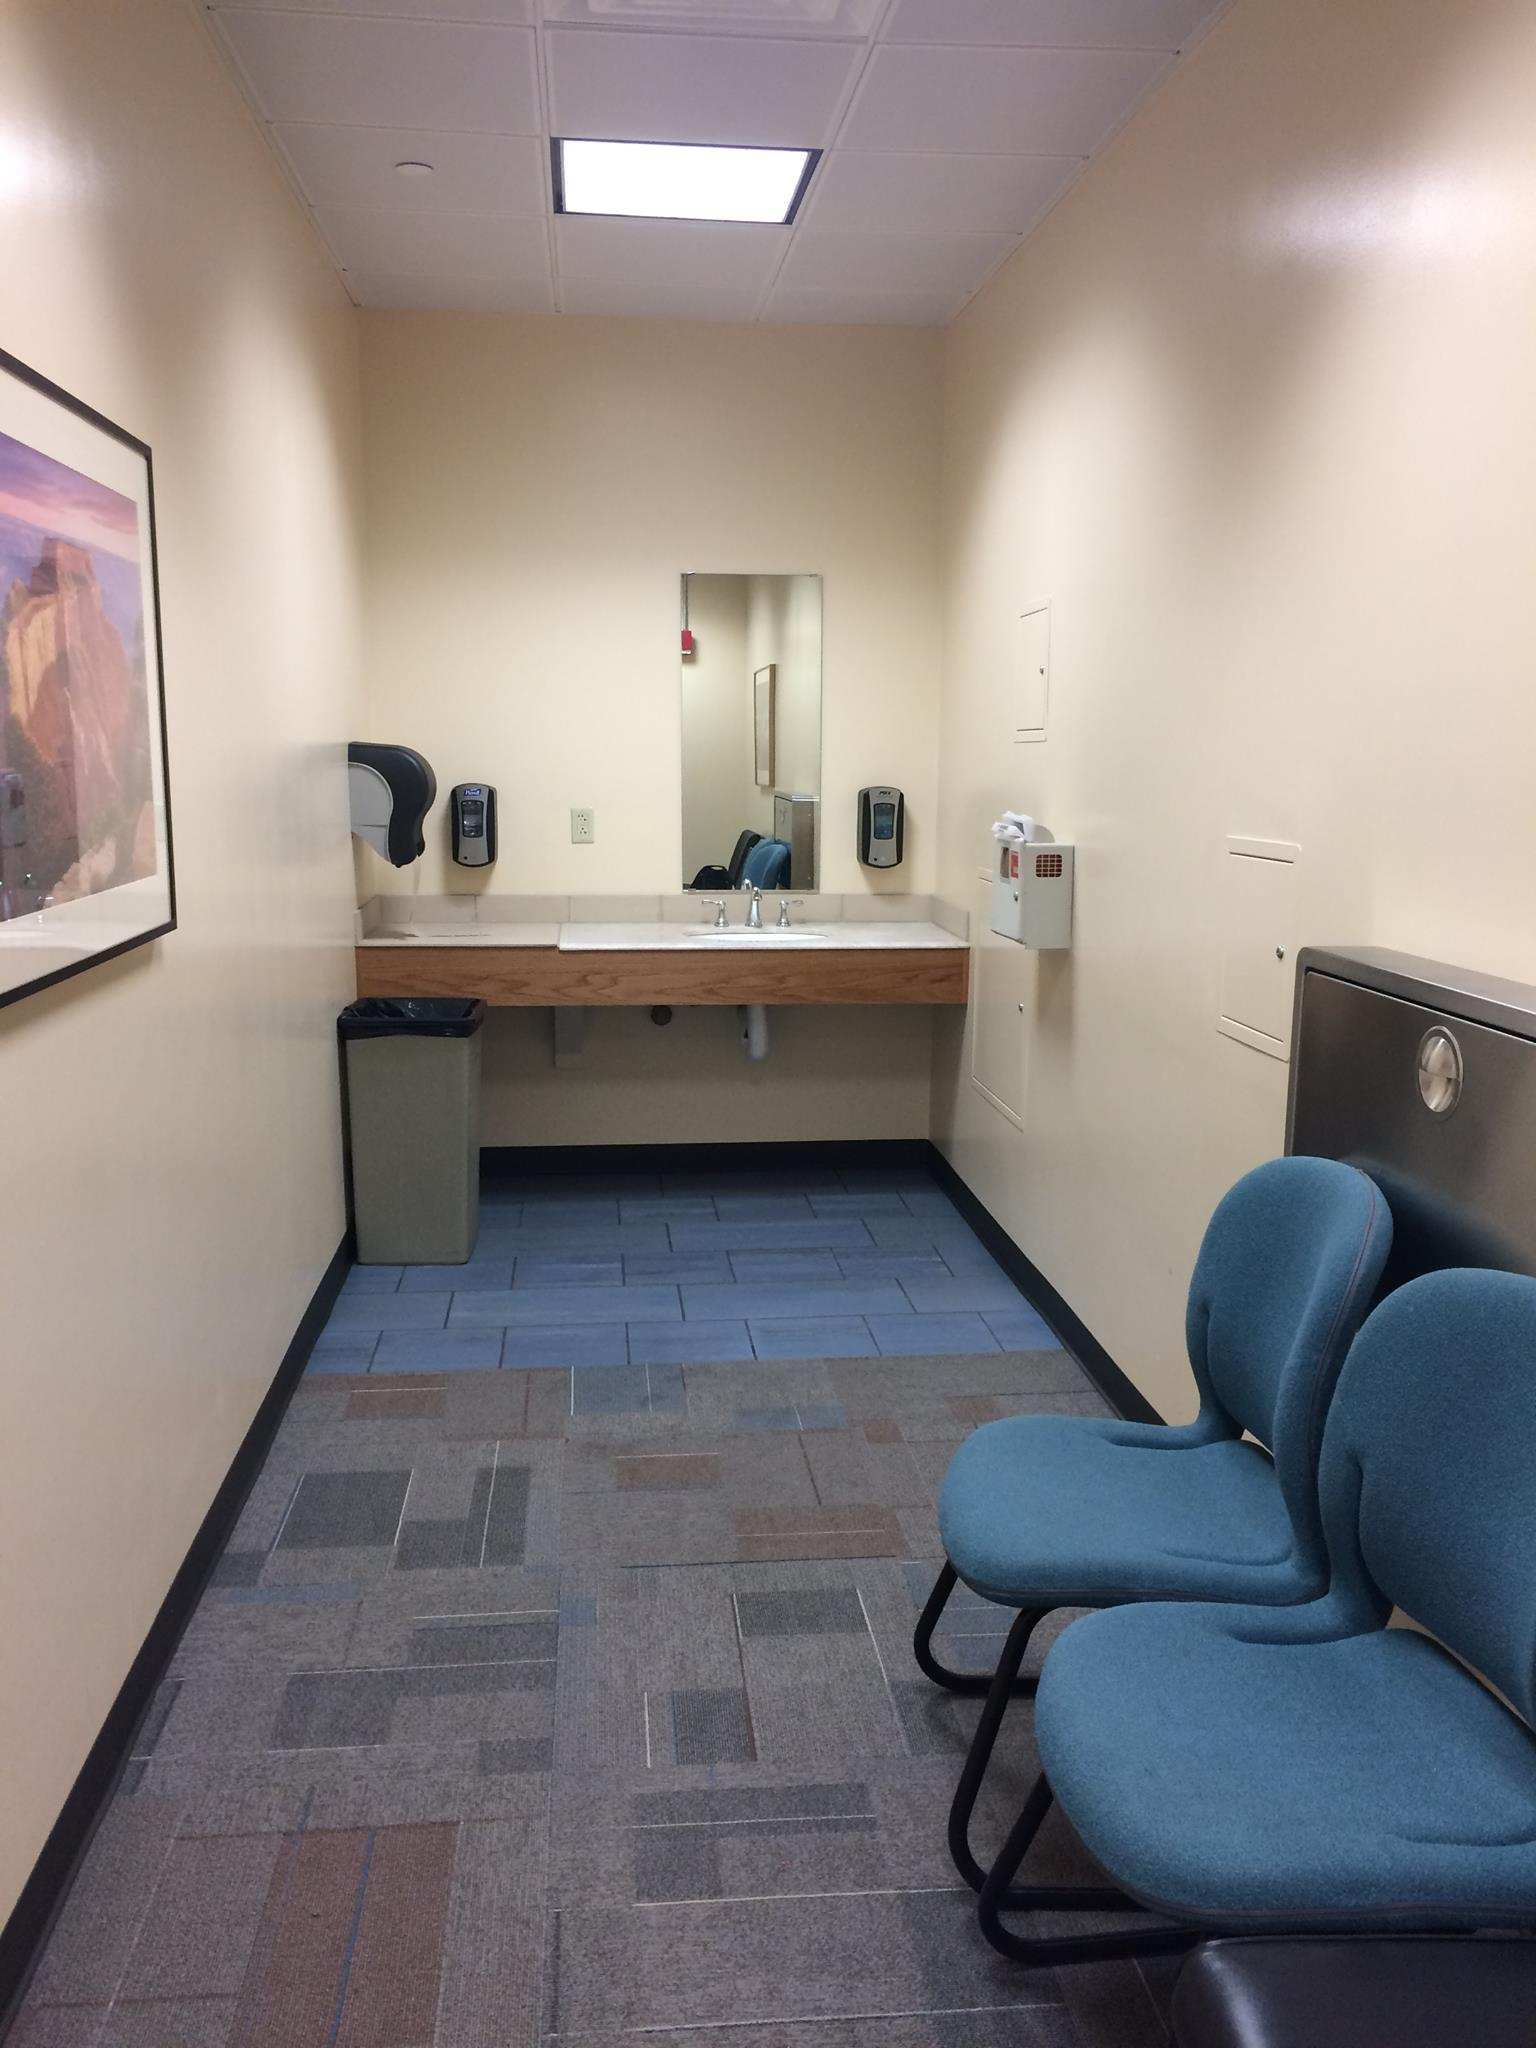 Pheonix arizona airport nursing mothers room 3